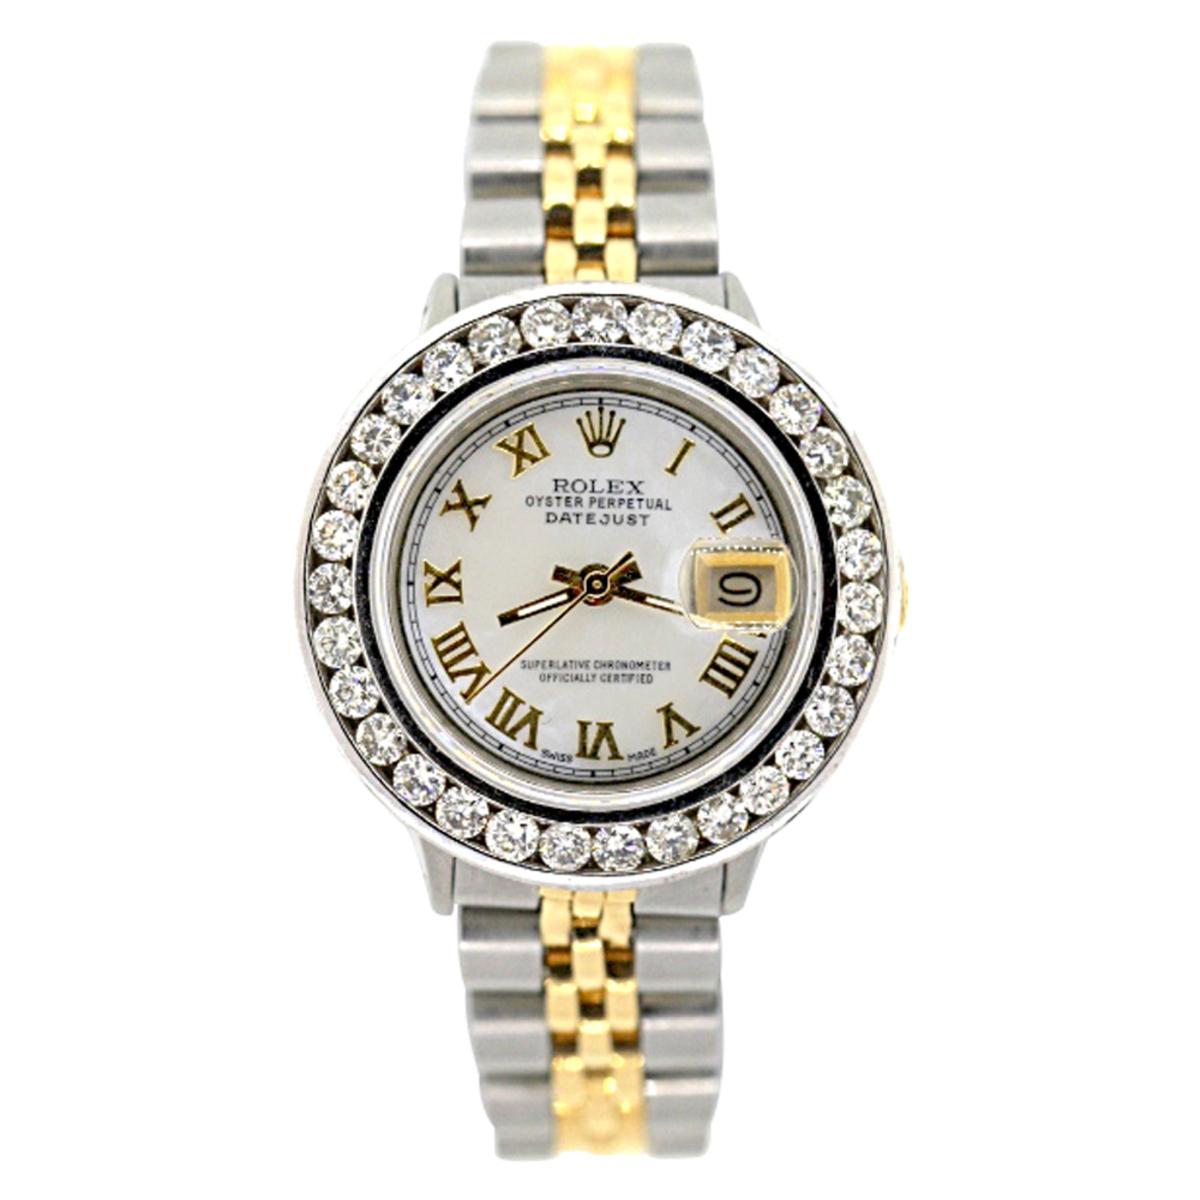 Rolex Datejust Womens Diamond Watch 2ct White MOP Steel and 18k Gold